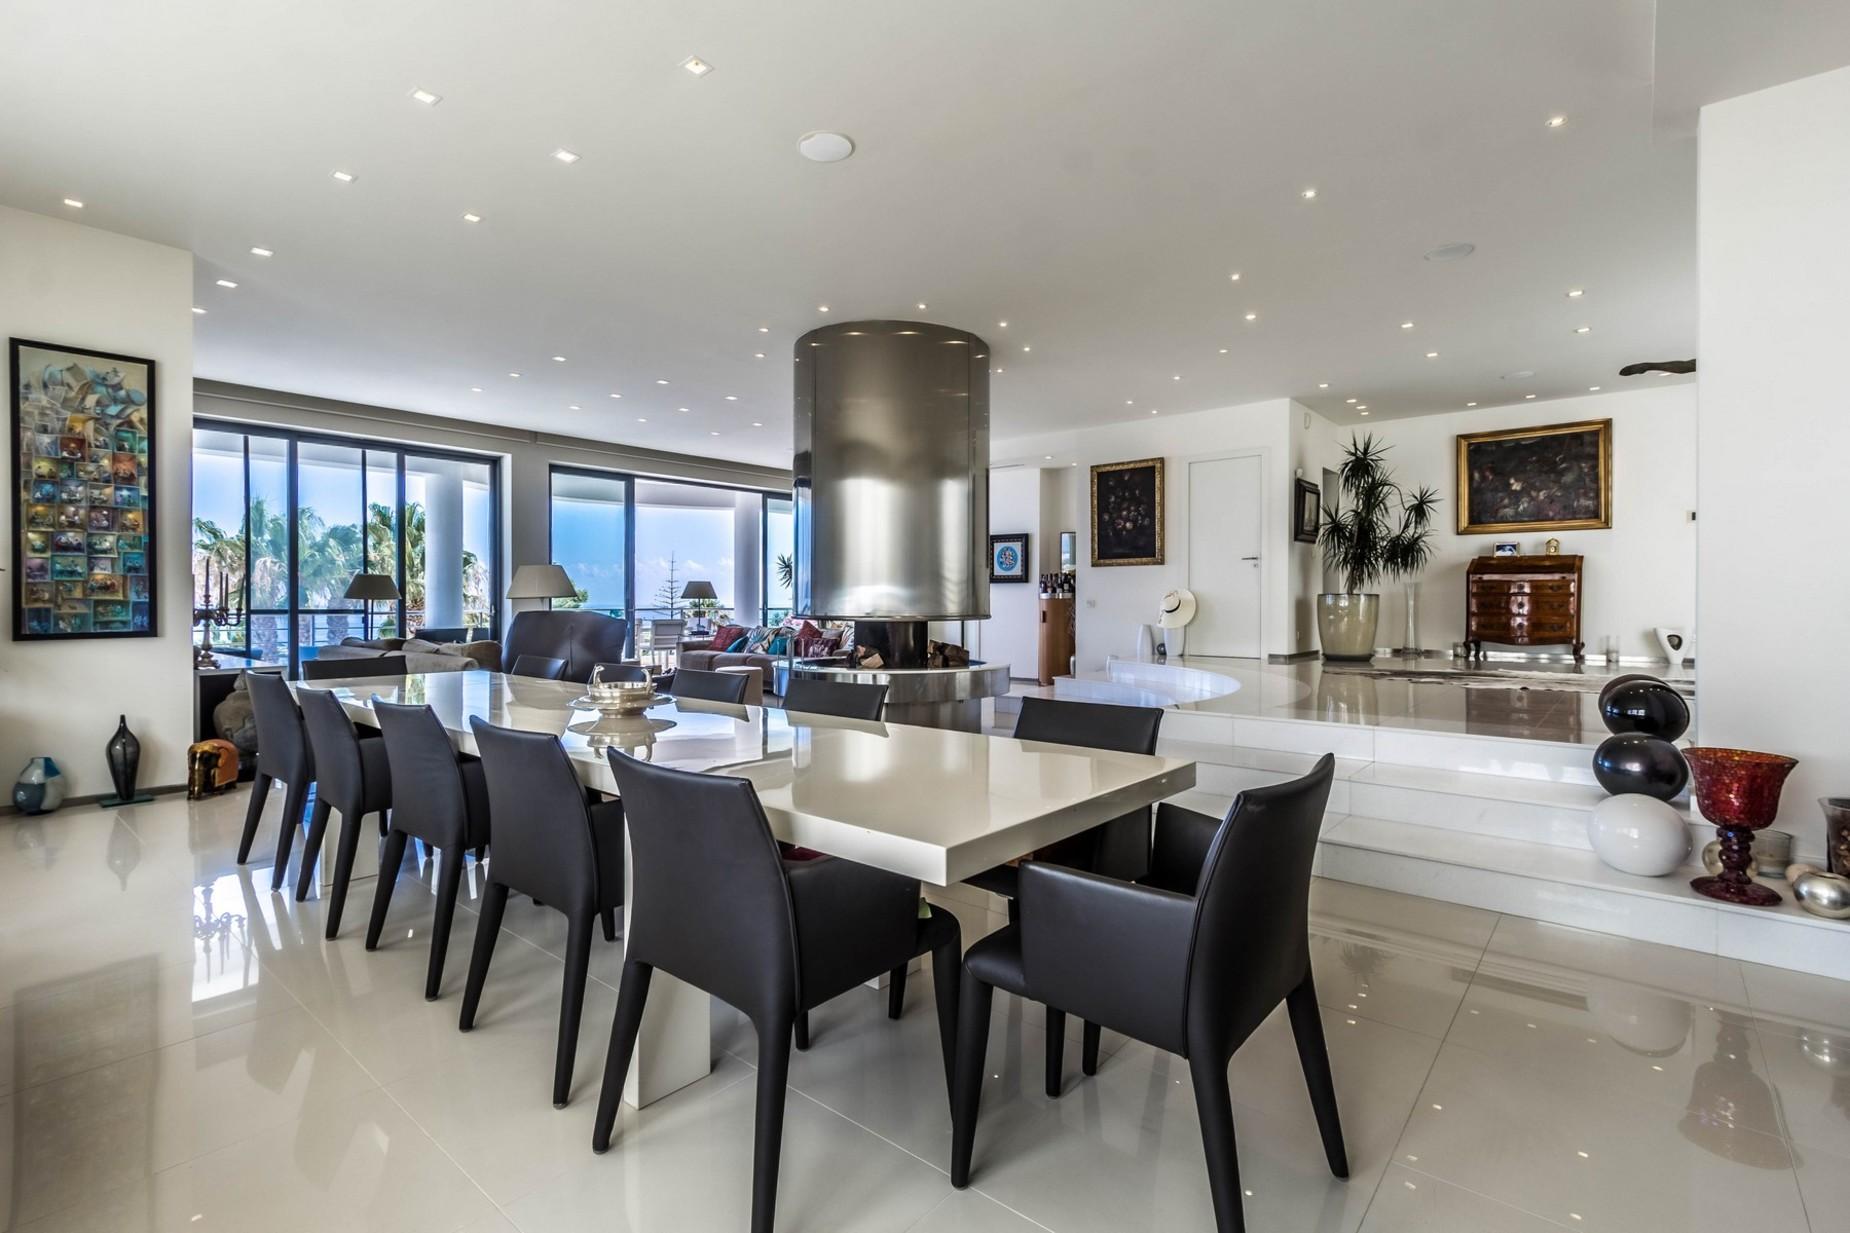 4 bed Villa For Rent in Mellieha, Mellieha - thumb 15